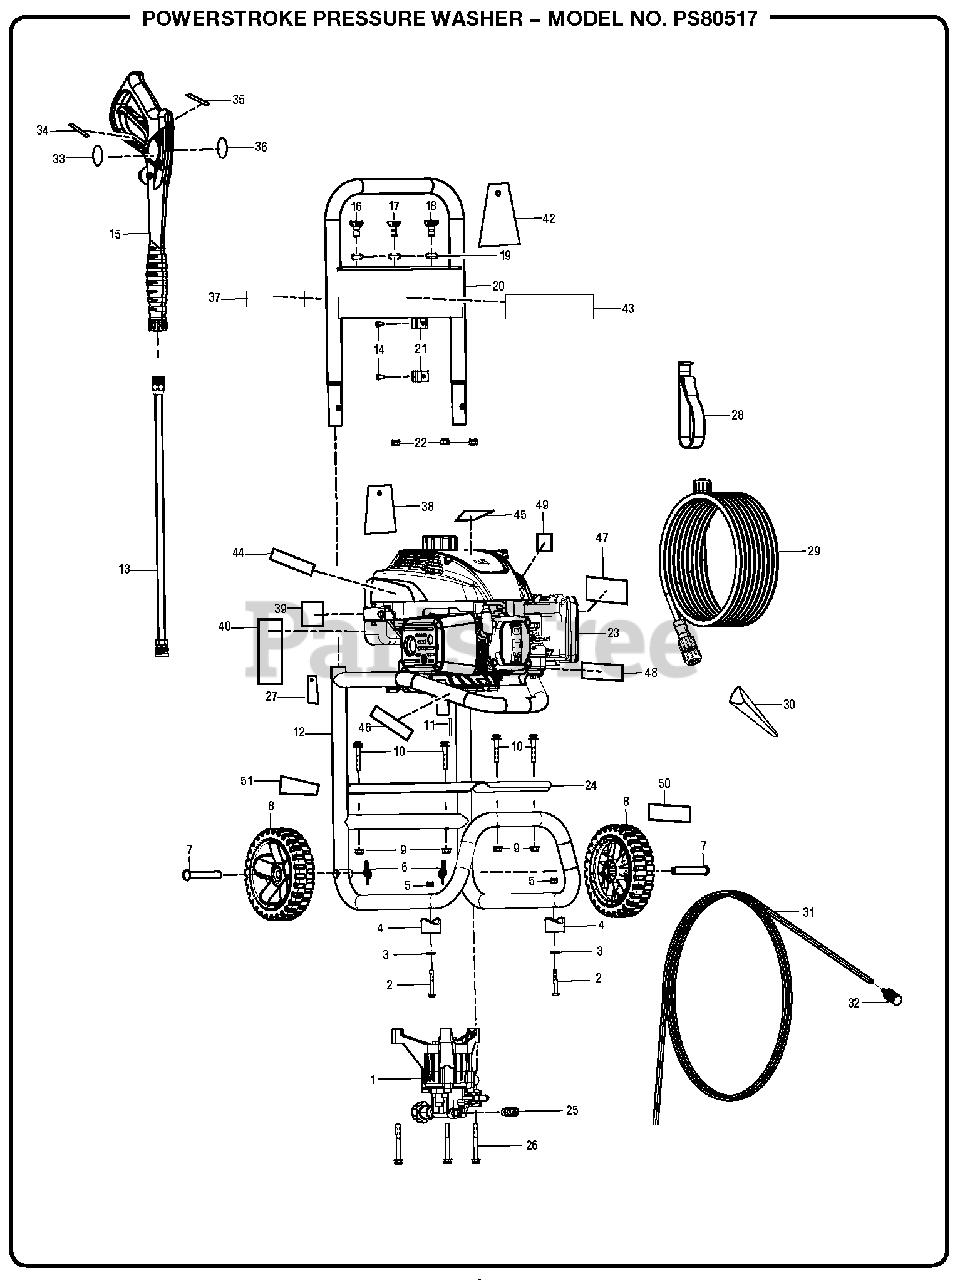 Powerstroke Pressure Washer Parts Diagram : powerstroke, pressure, washer, parts, diagram, PowerStroke, 80517, Pressure, Washer, General, Assembly, (Part, Parts, Lookup, Diagrams, PartsTree